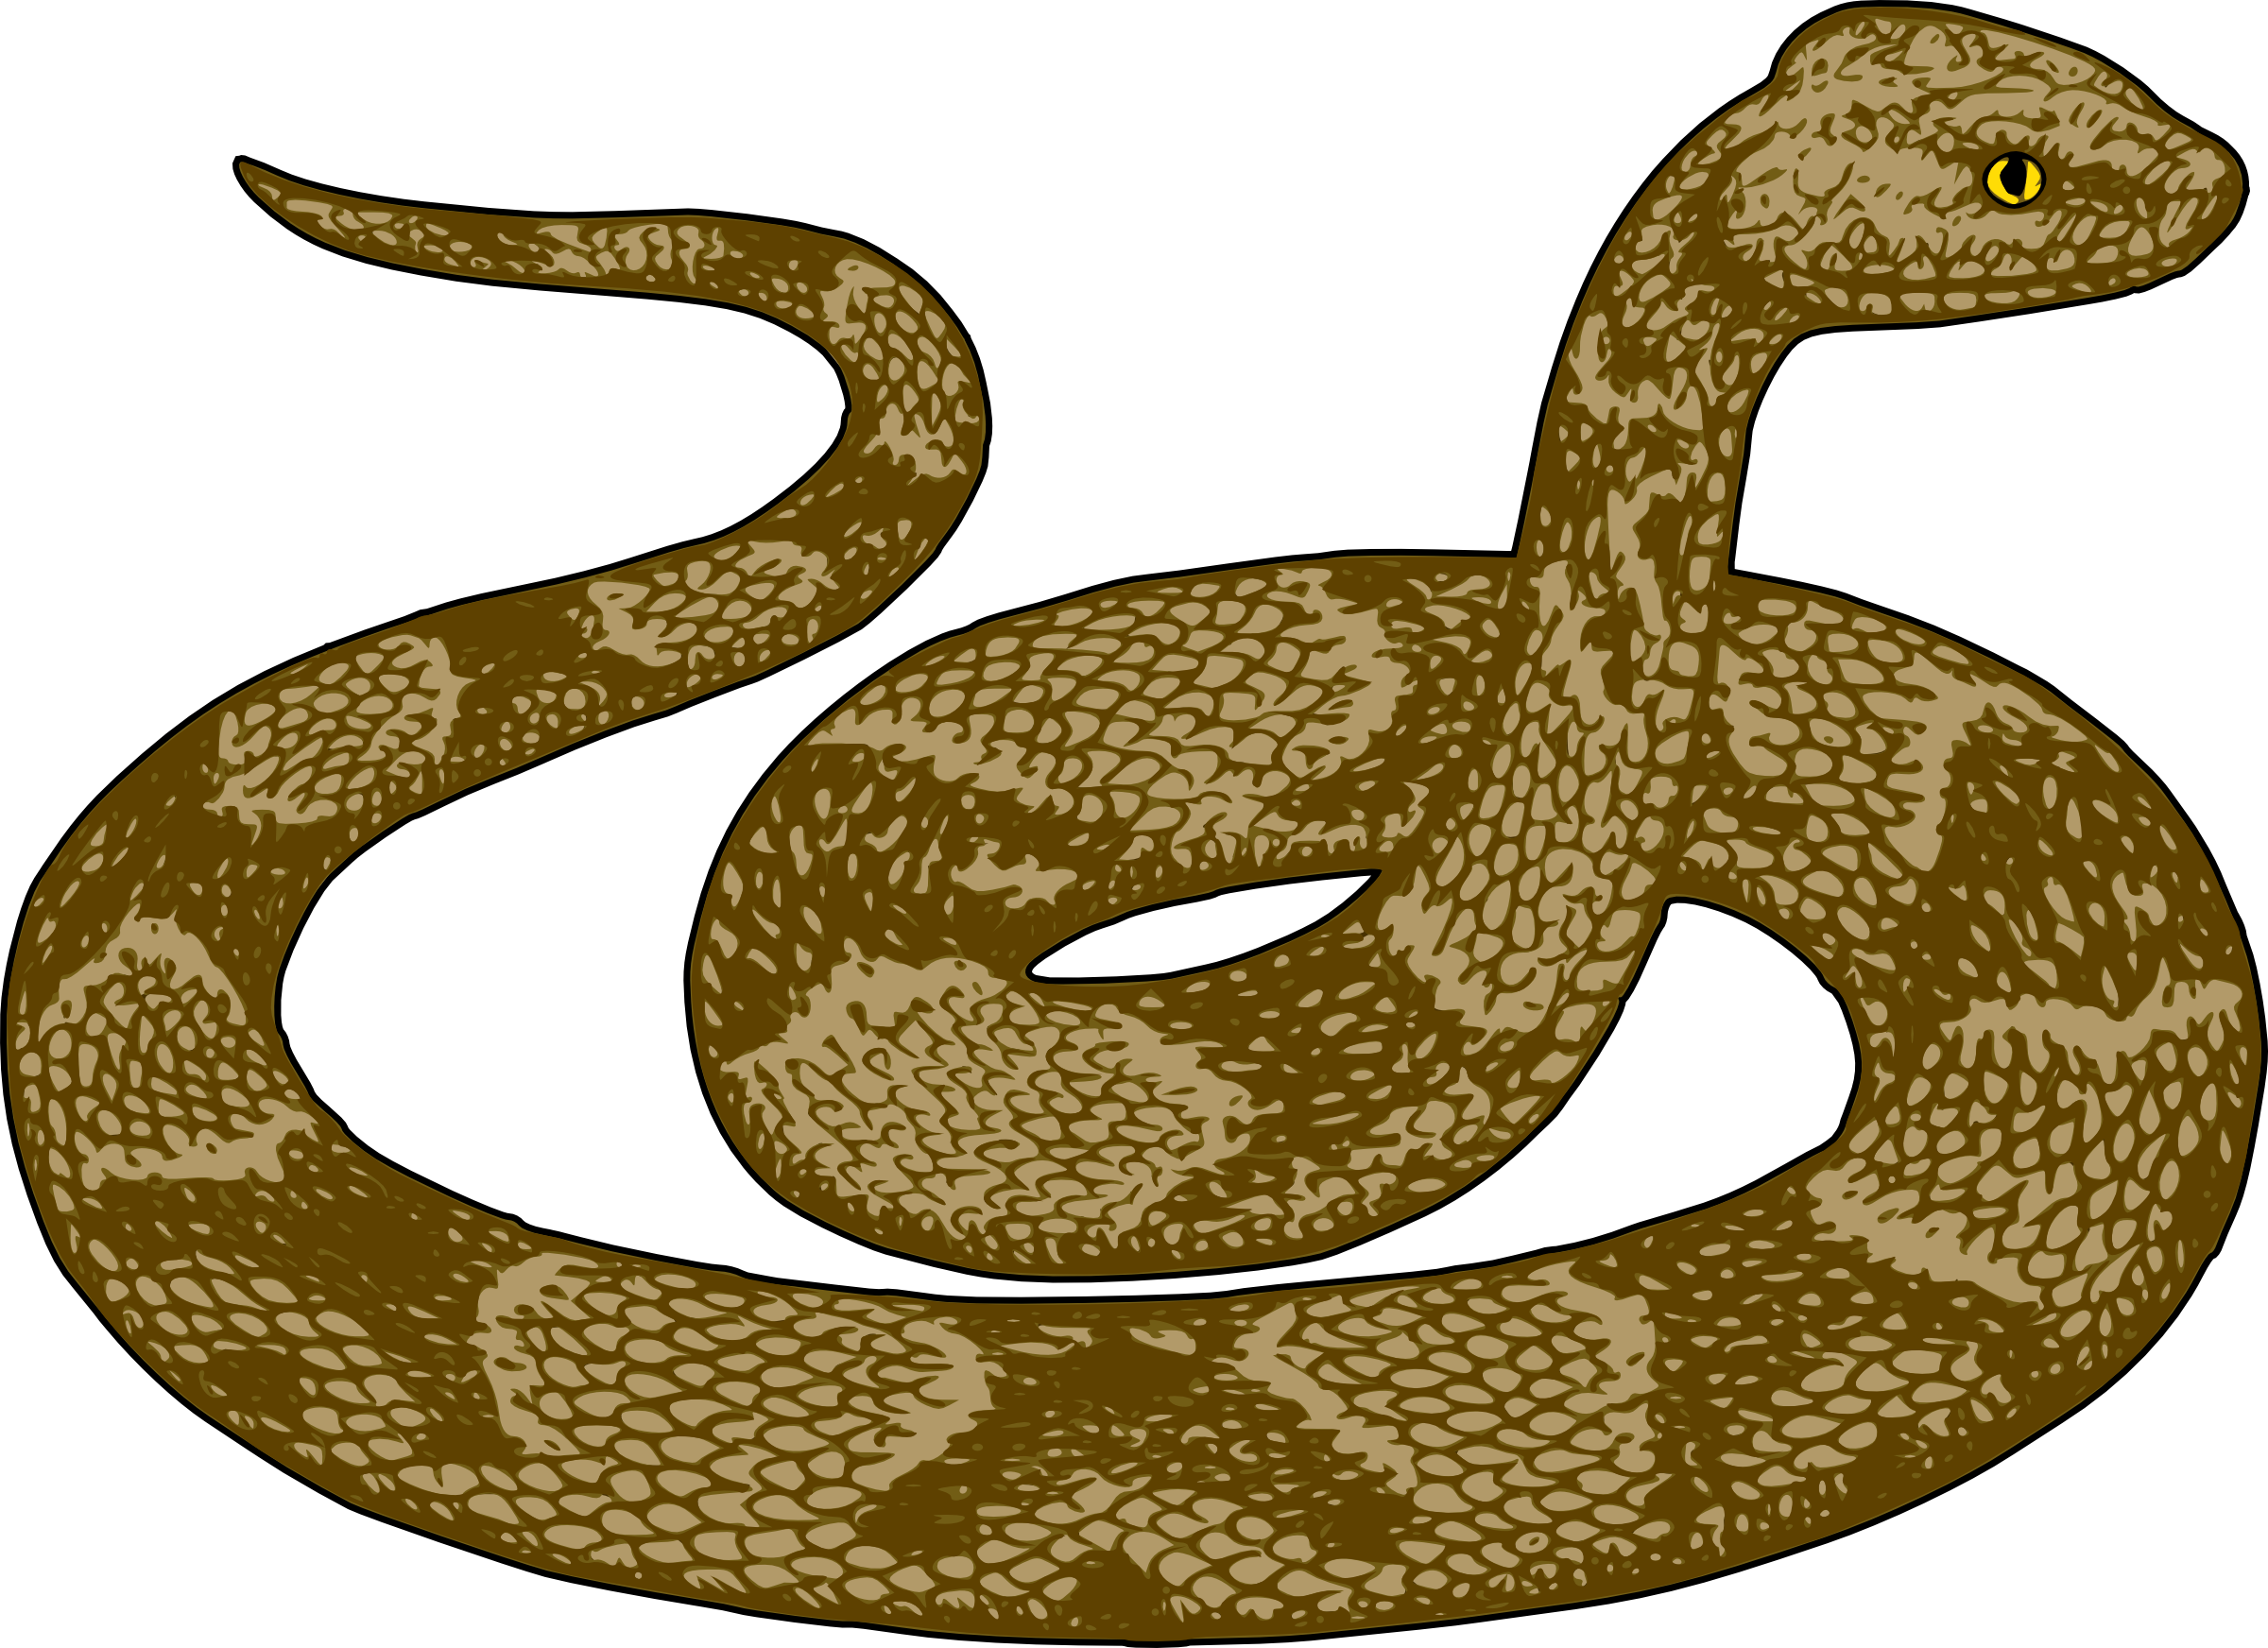 Snack clip art free. Snake clipart vintage